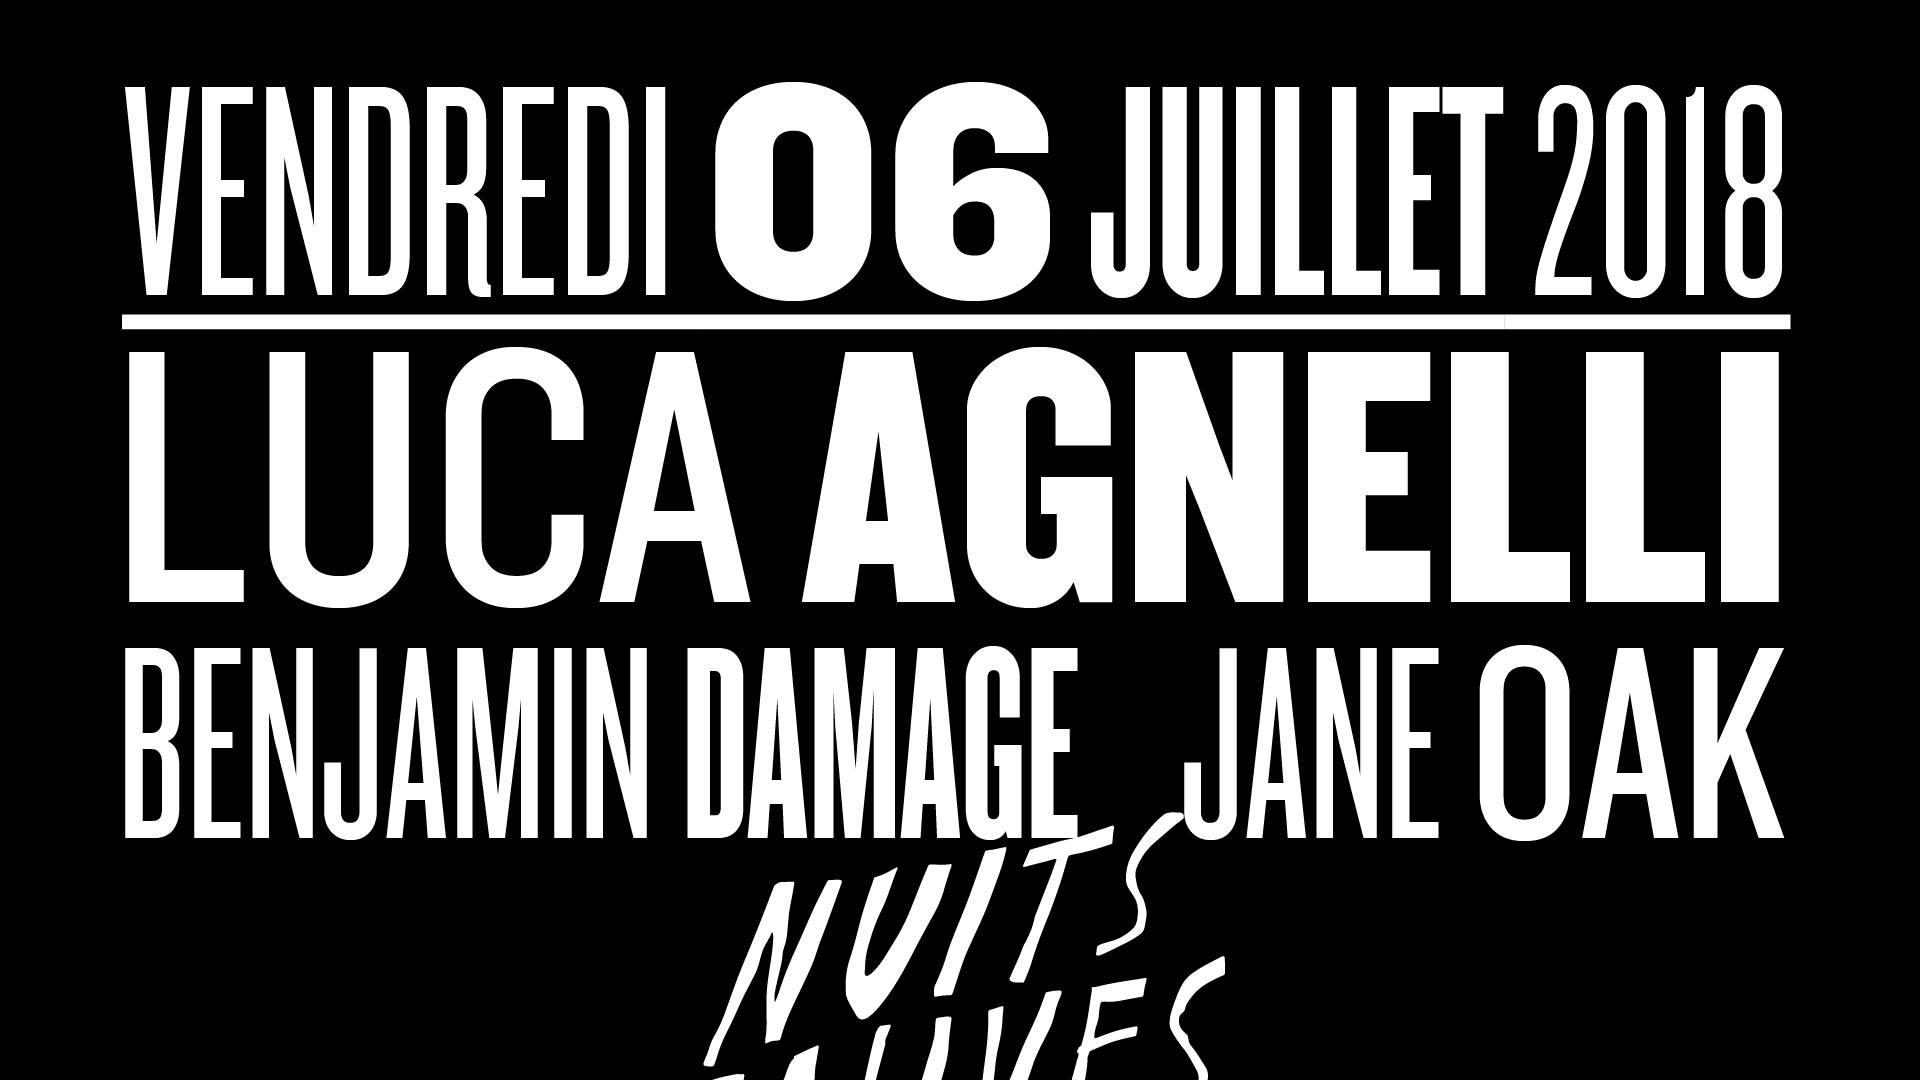 Luca Agnelli - Benjamin Damage - Jane Oak